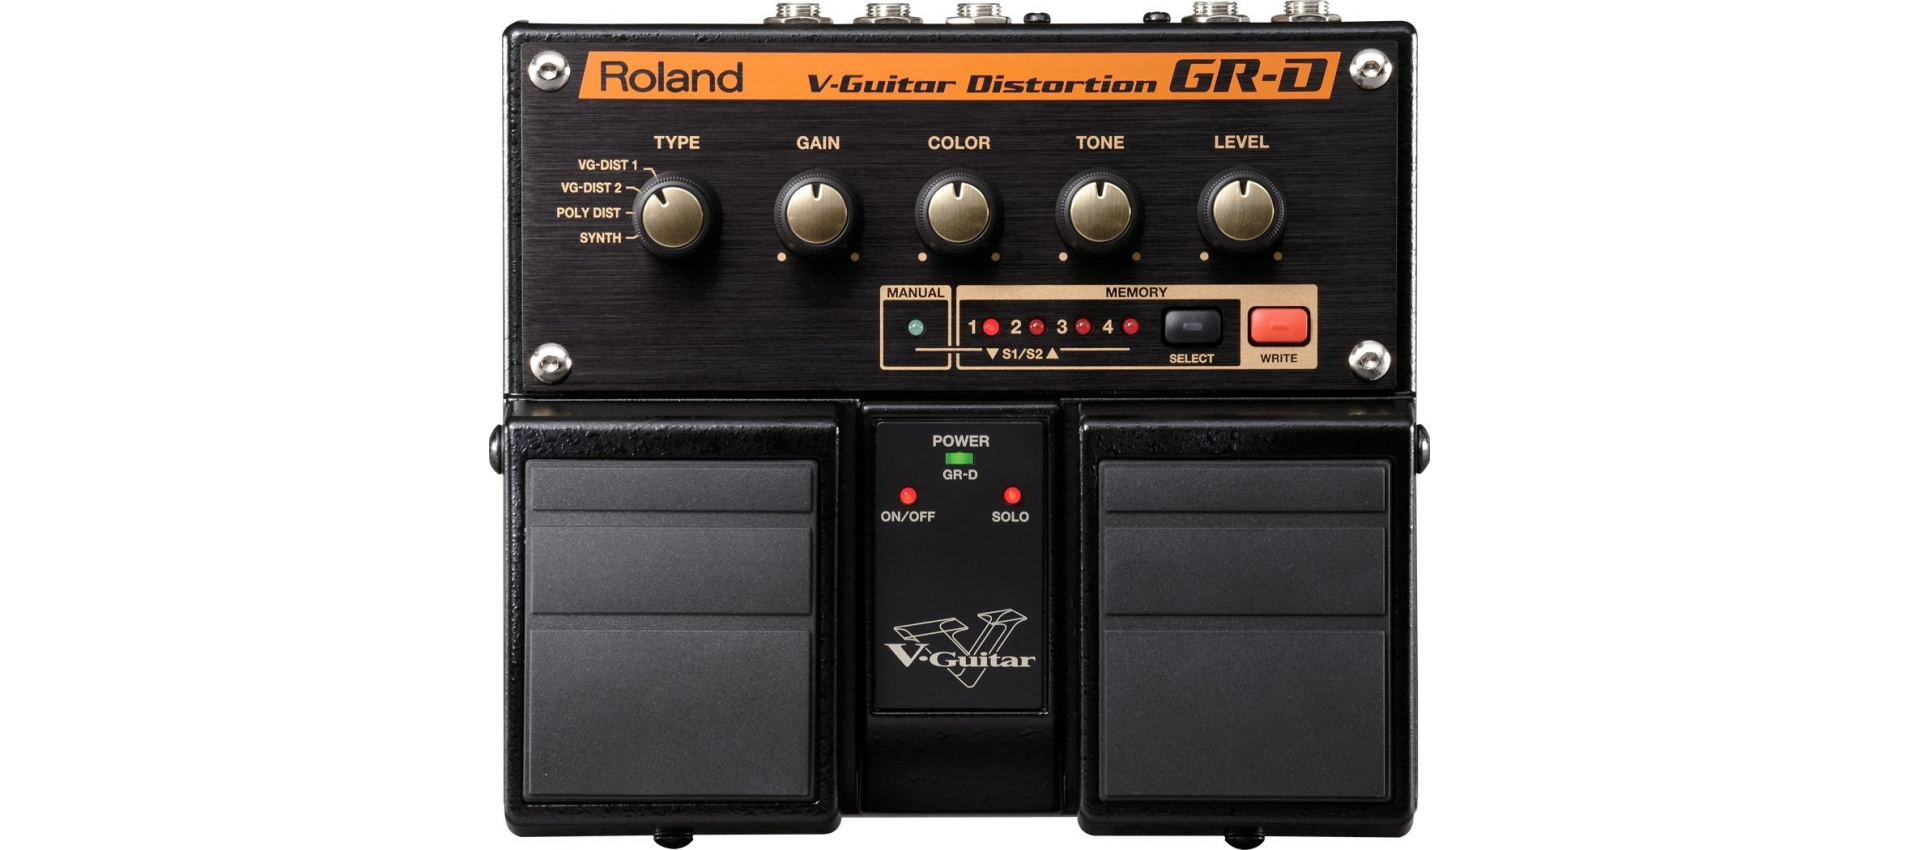 roland grd v guitar distortion pedal pedali per chitarra. Black Bedroom Furniture Sets. Home Design Ideas